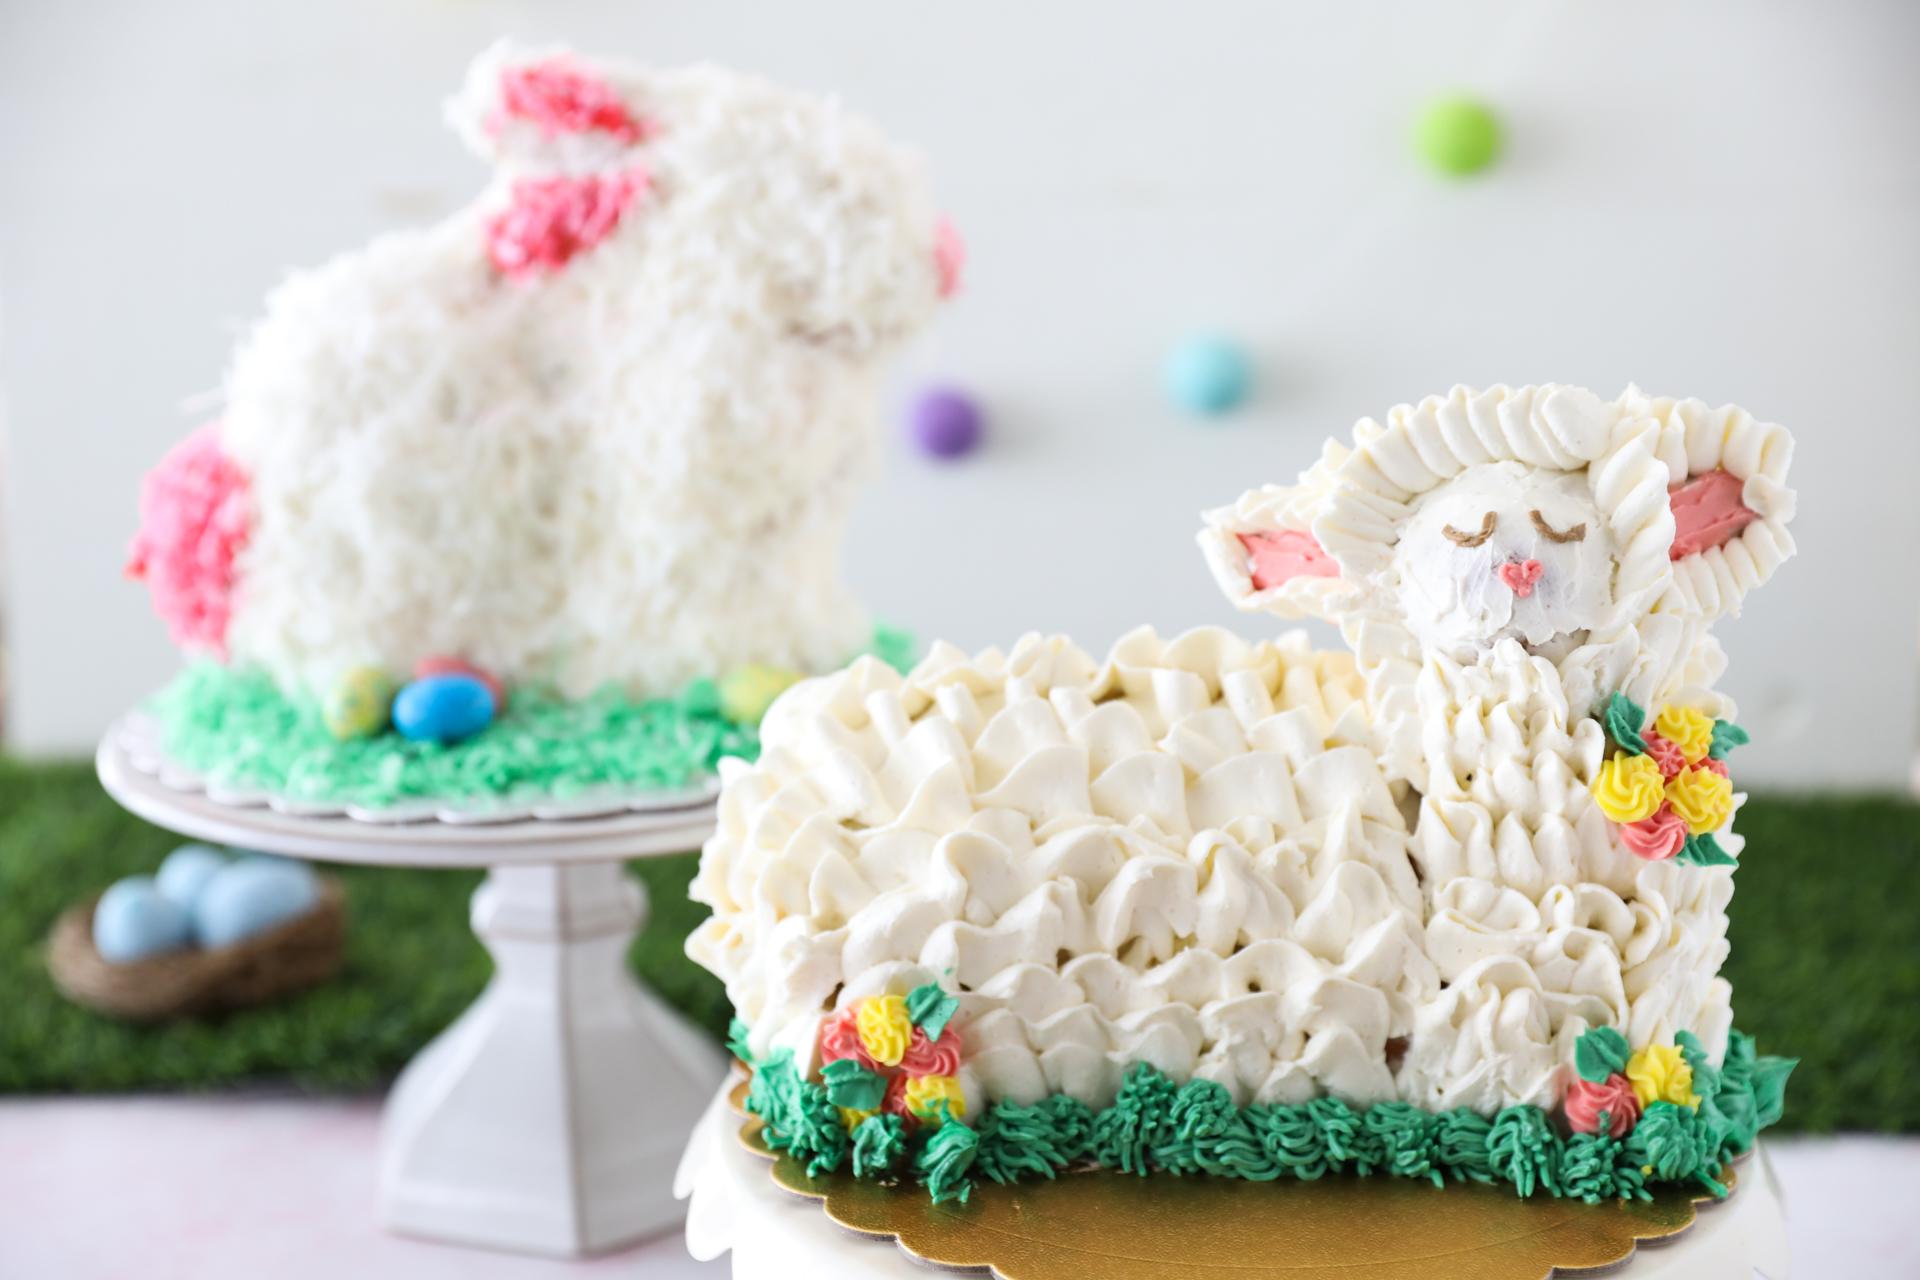 Lamb And Rabbit-Shaped Cakes